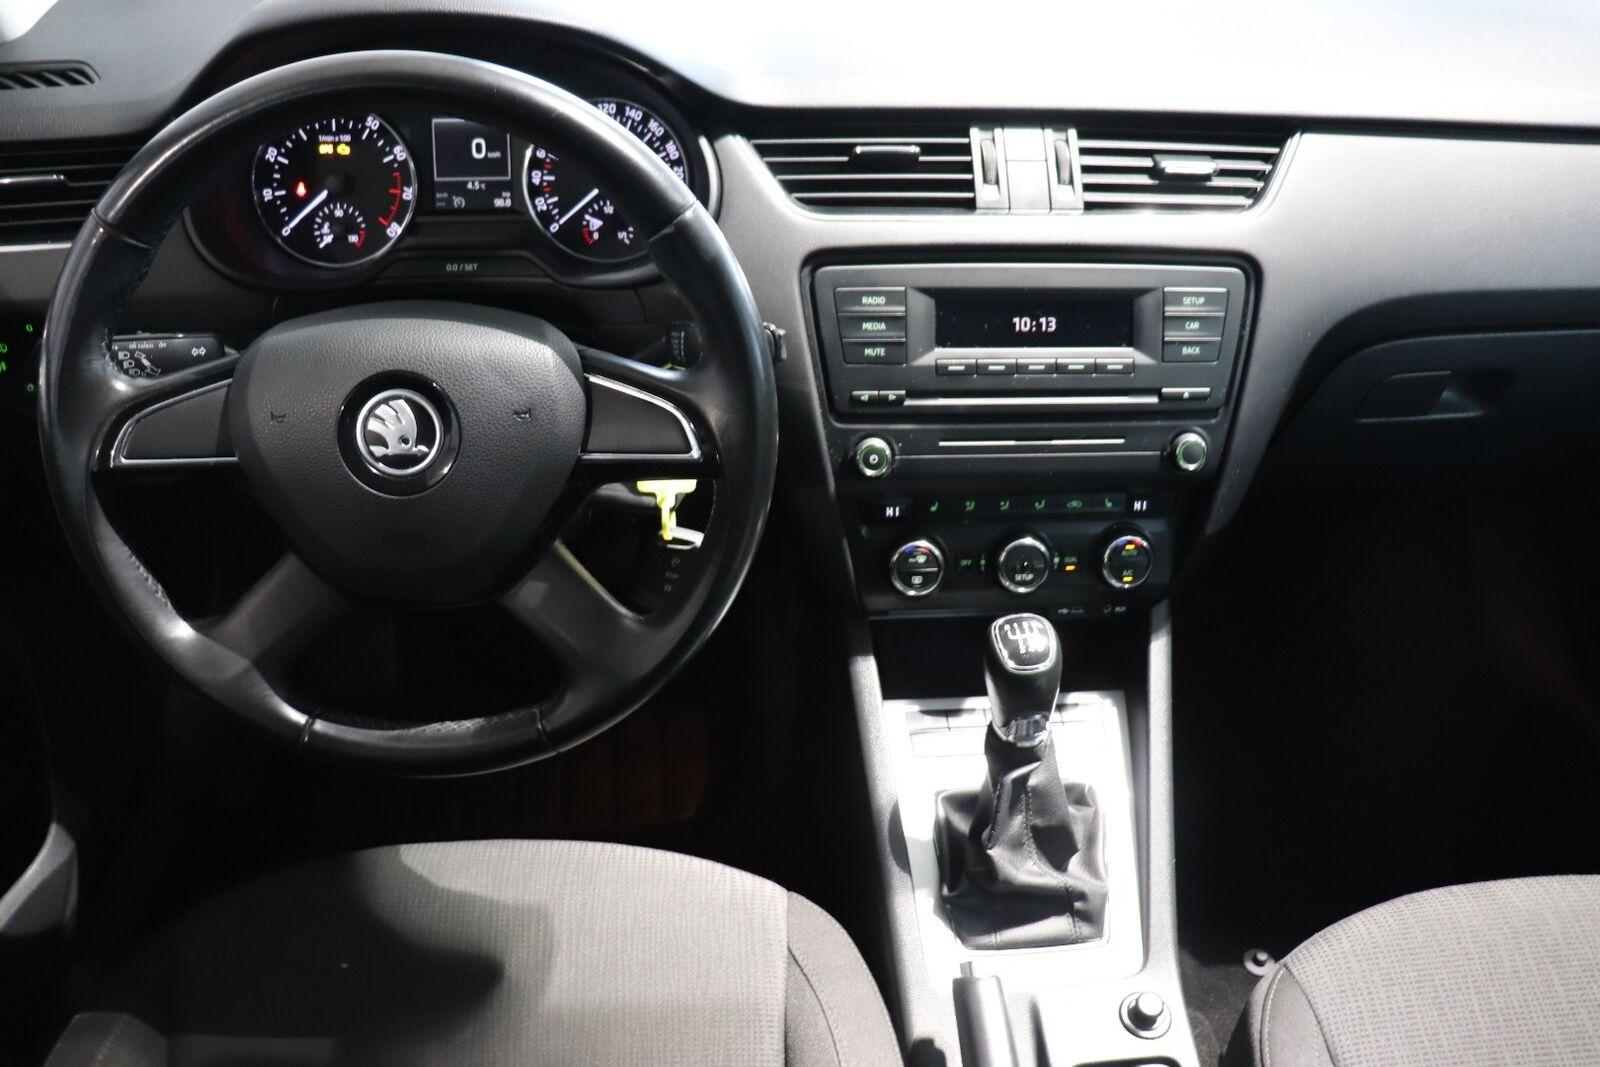 Skoda Octavia TSi 140 Elegance Combi